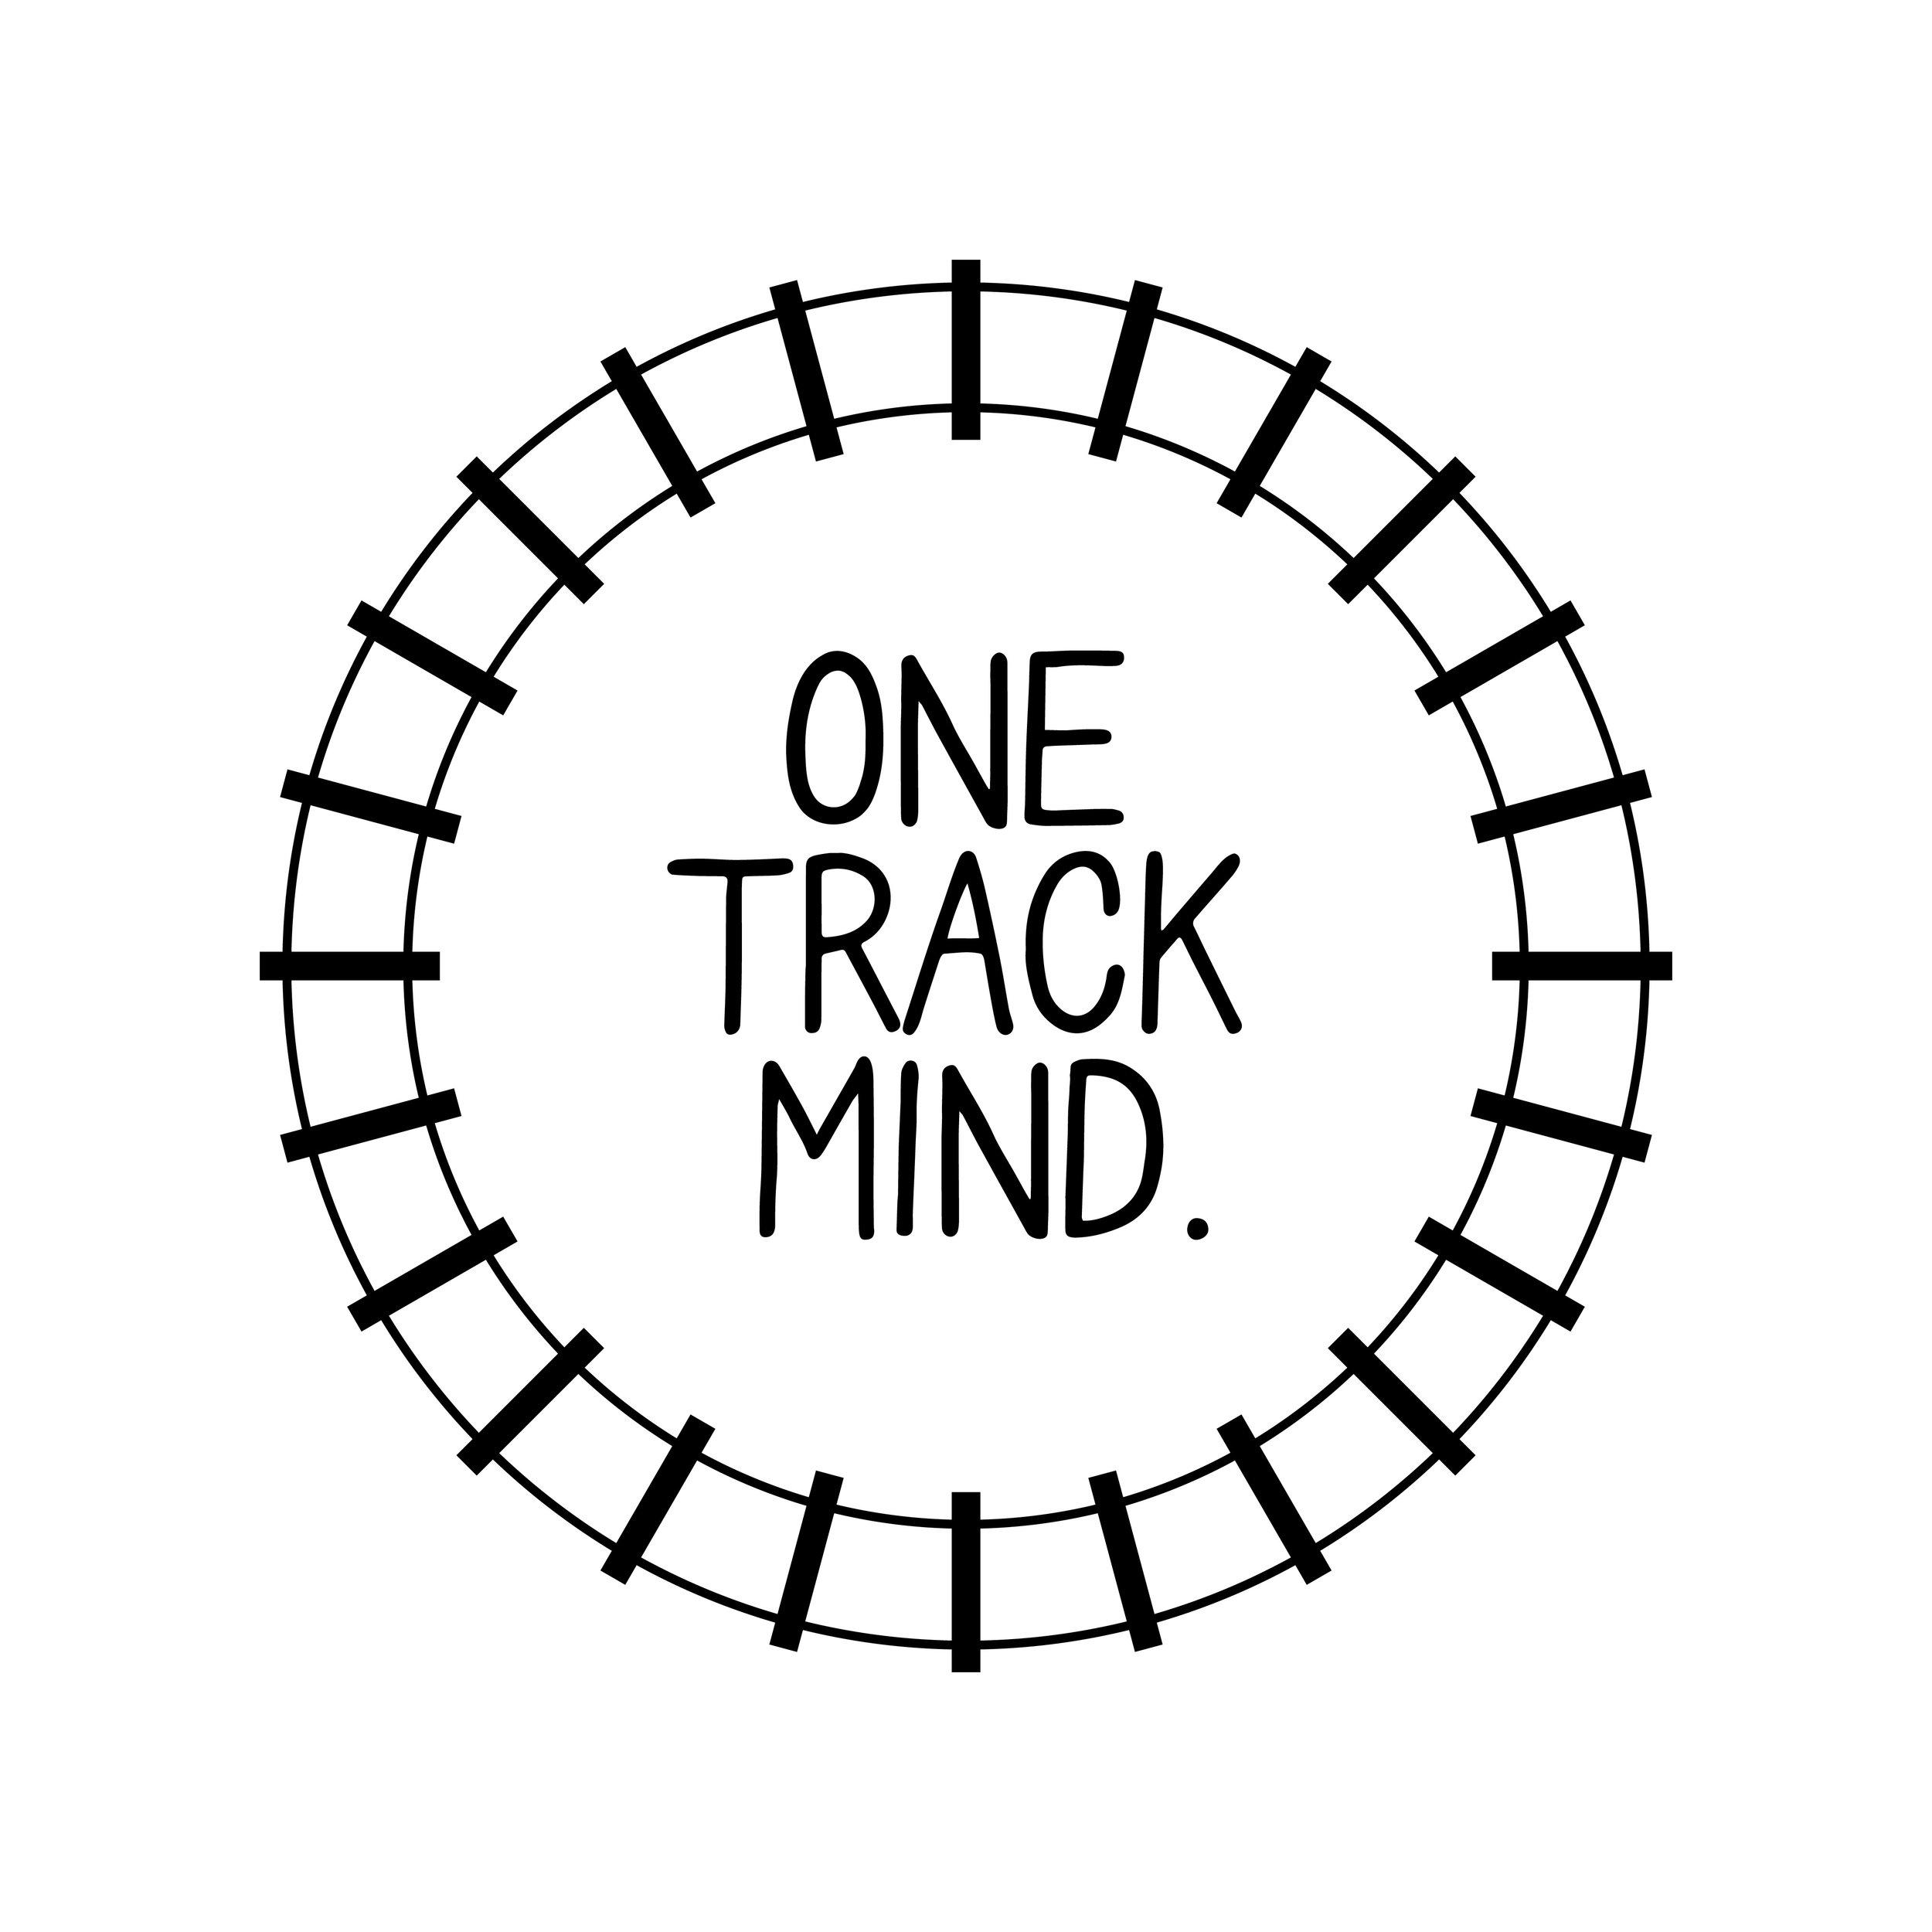 onetrackmind-01.jpg